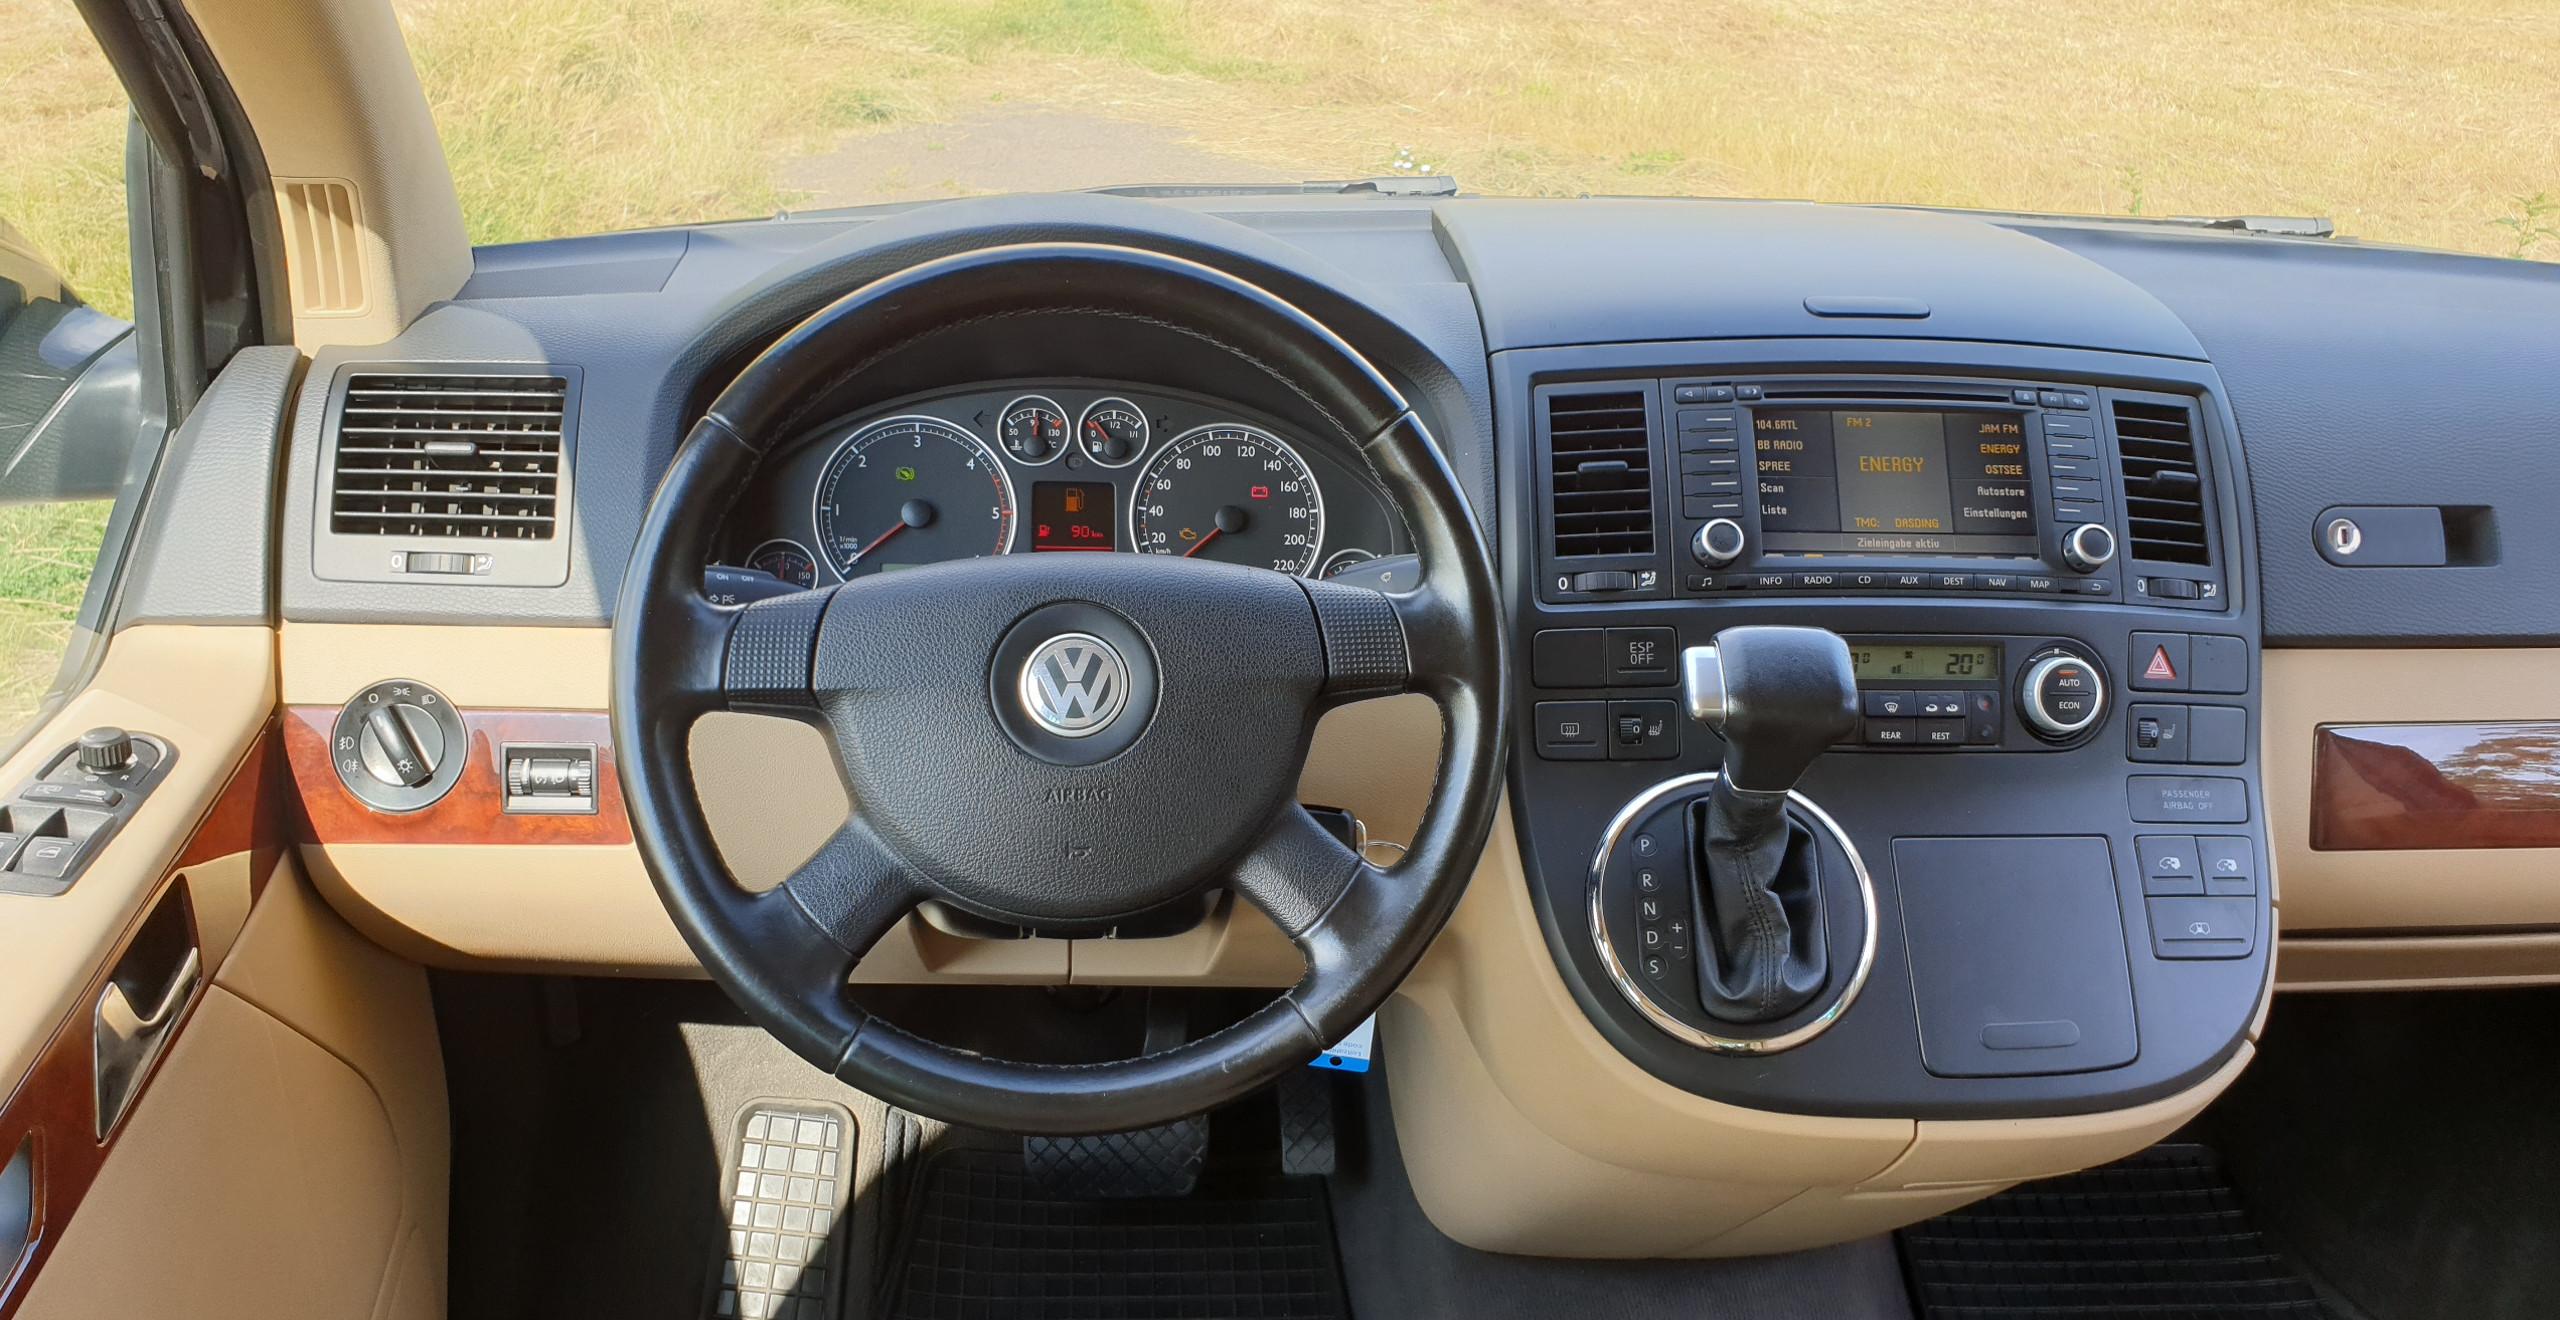 Import Auto Allemagne - Auto Convoi Allemagne - Volkswagen T5 Multivan Highline 2.5 TDI 174ch